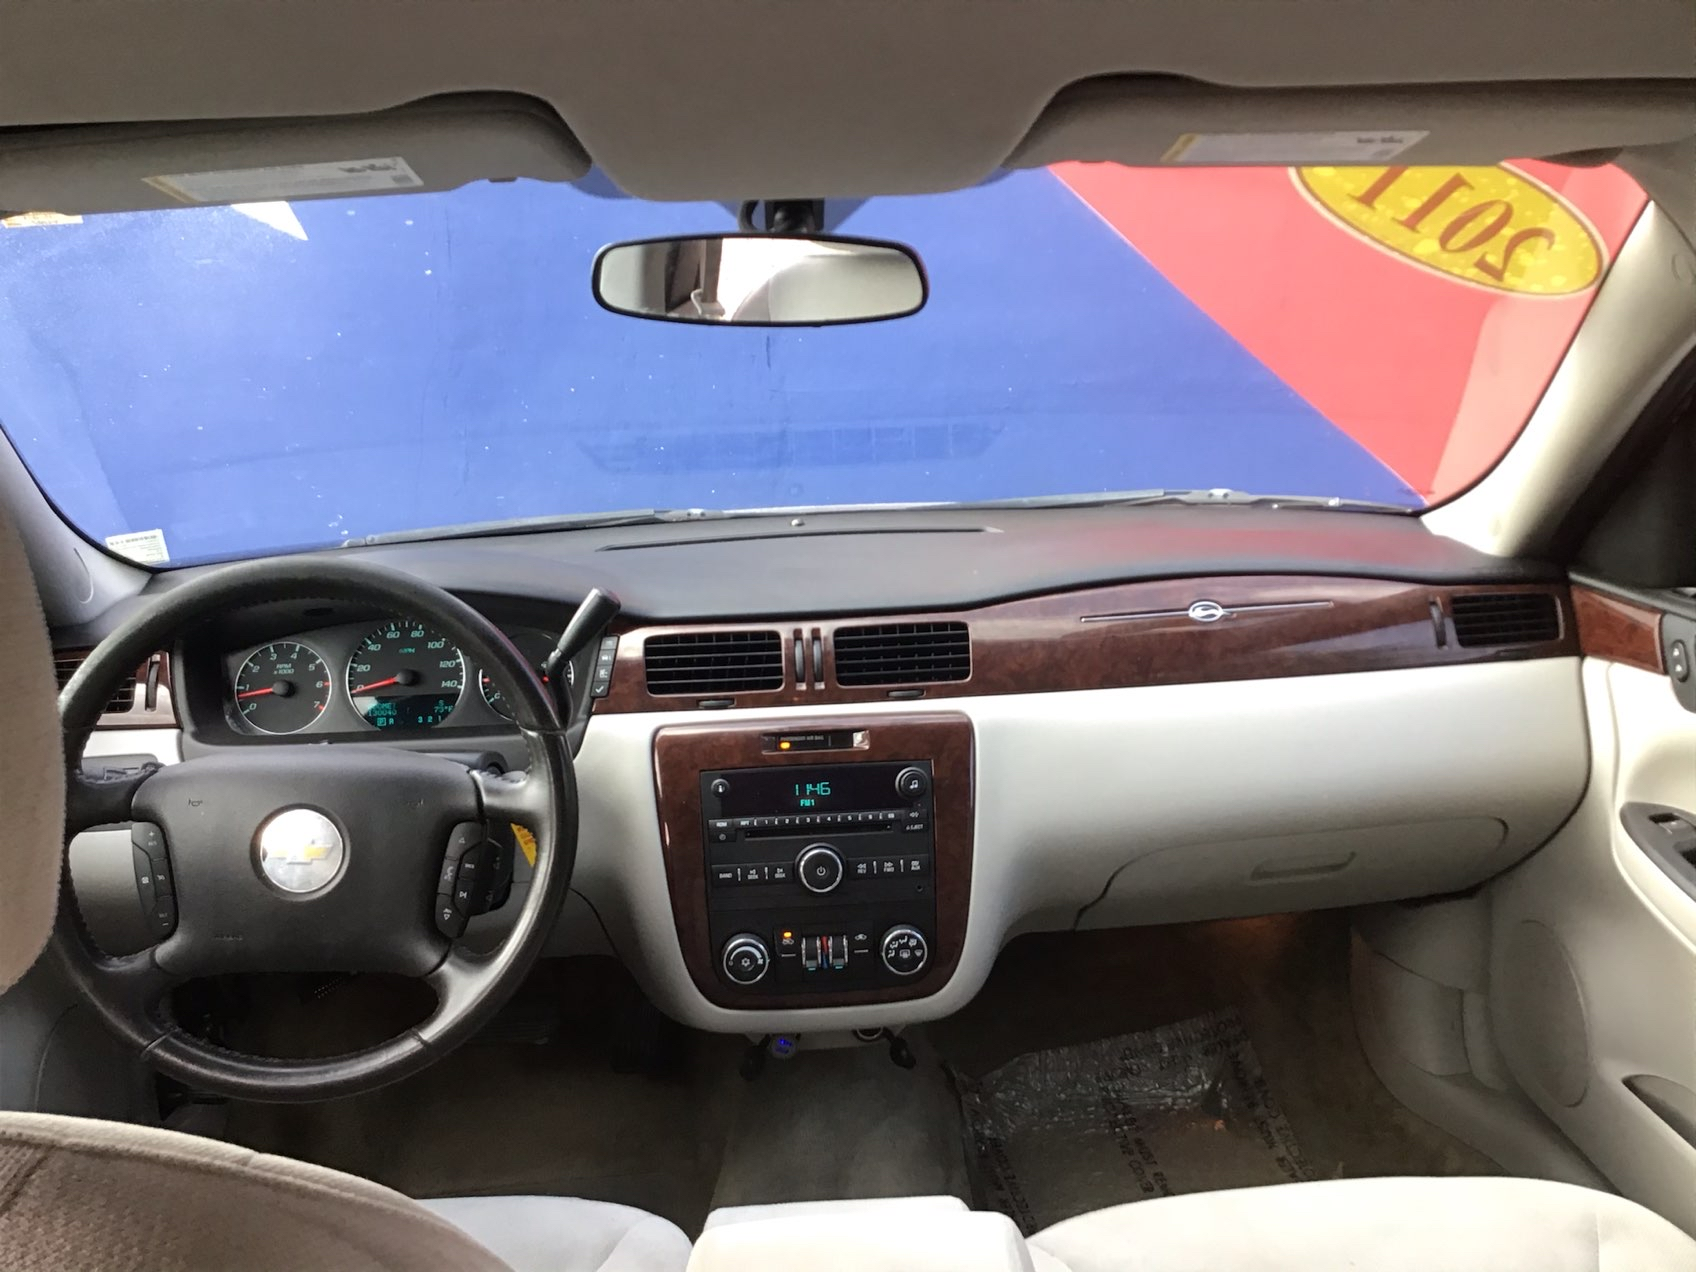 used vehicle - Sedan CHEVROLET IMPALA 2011